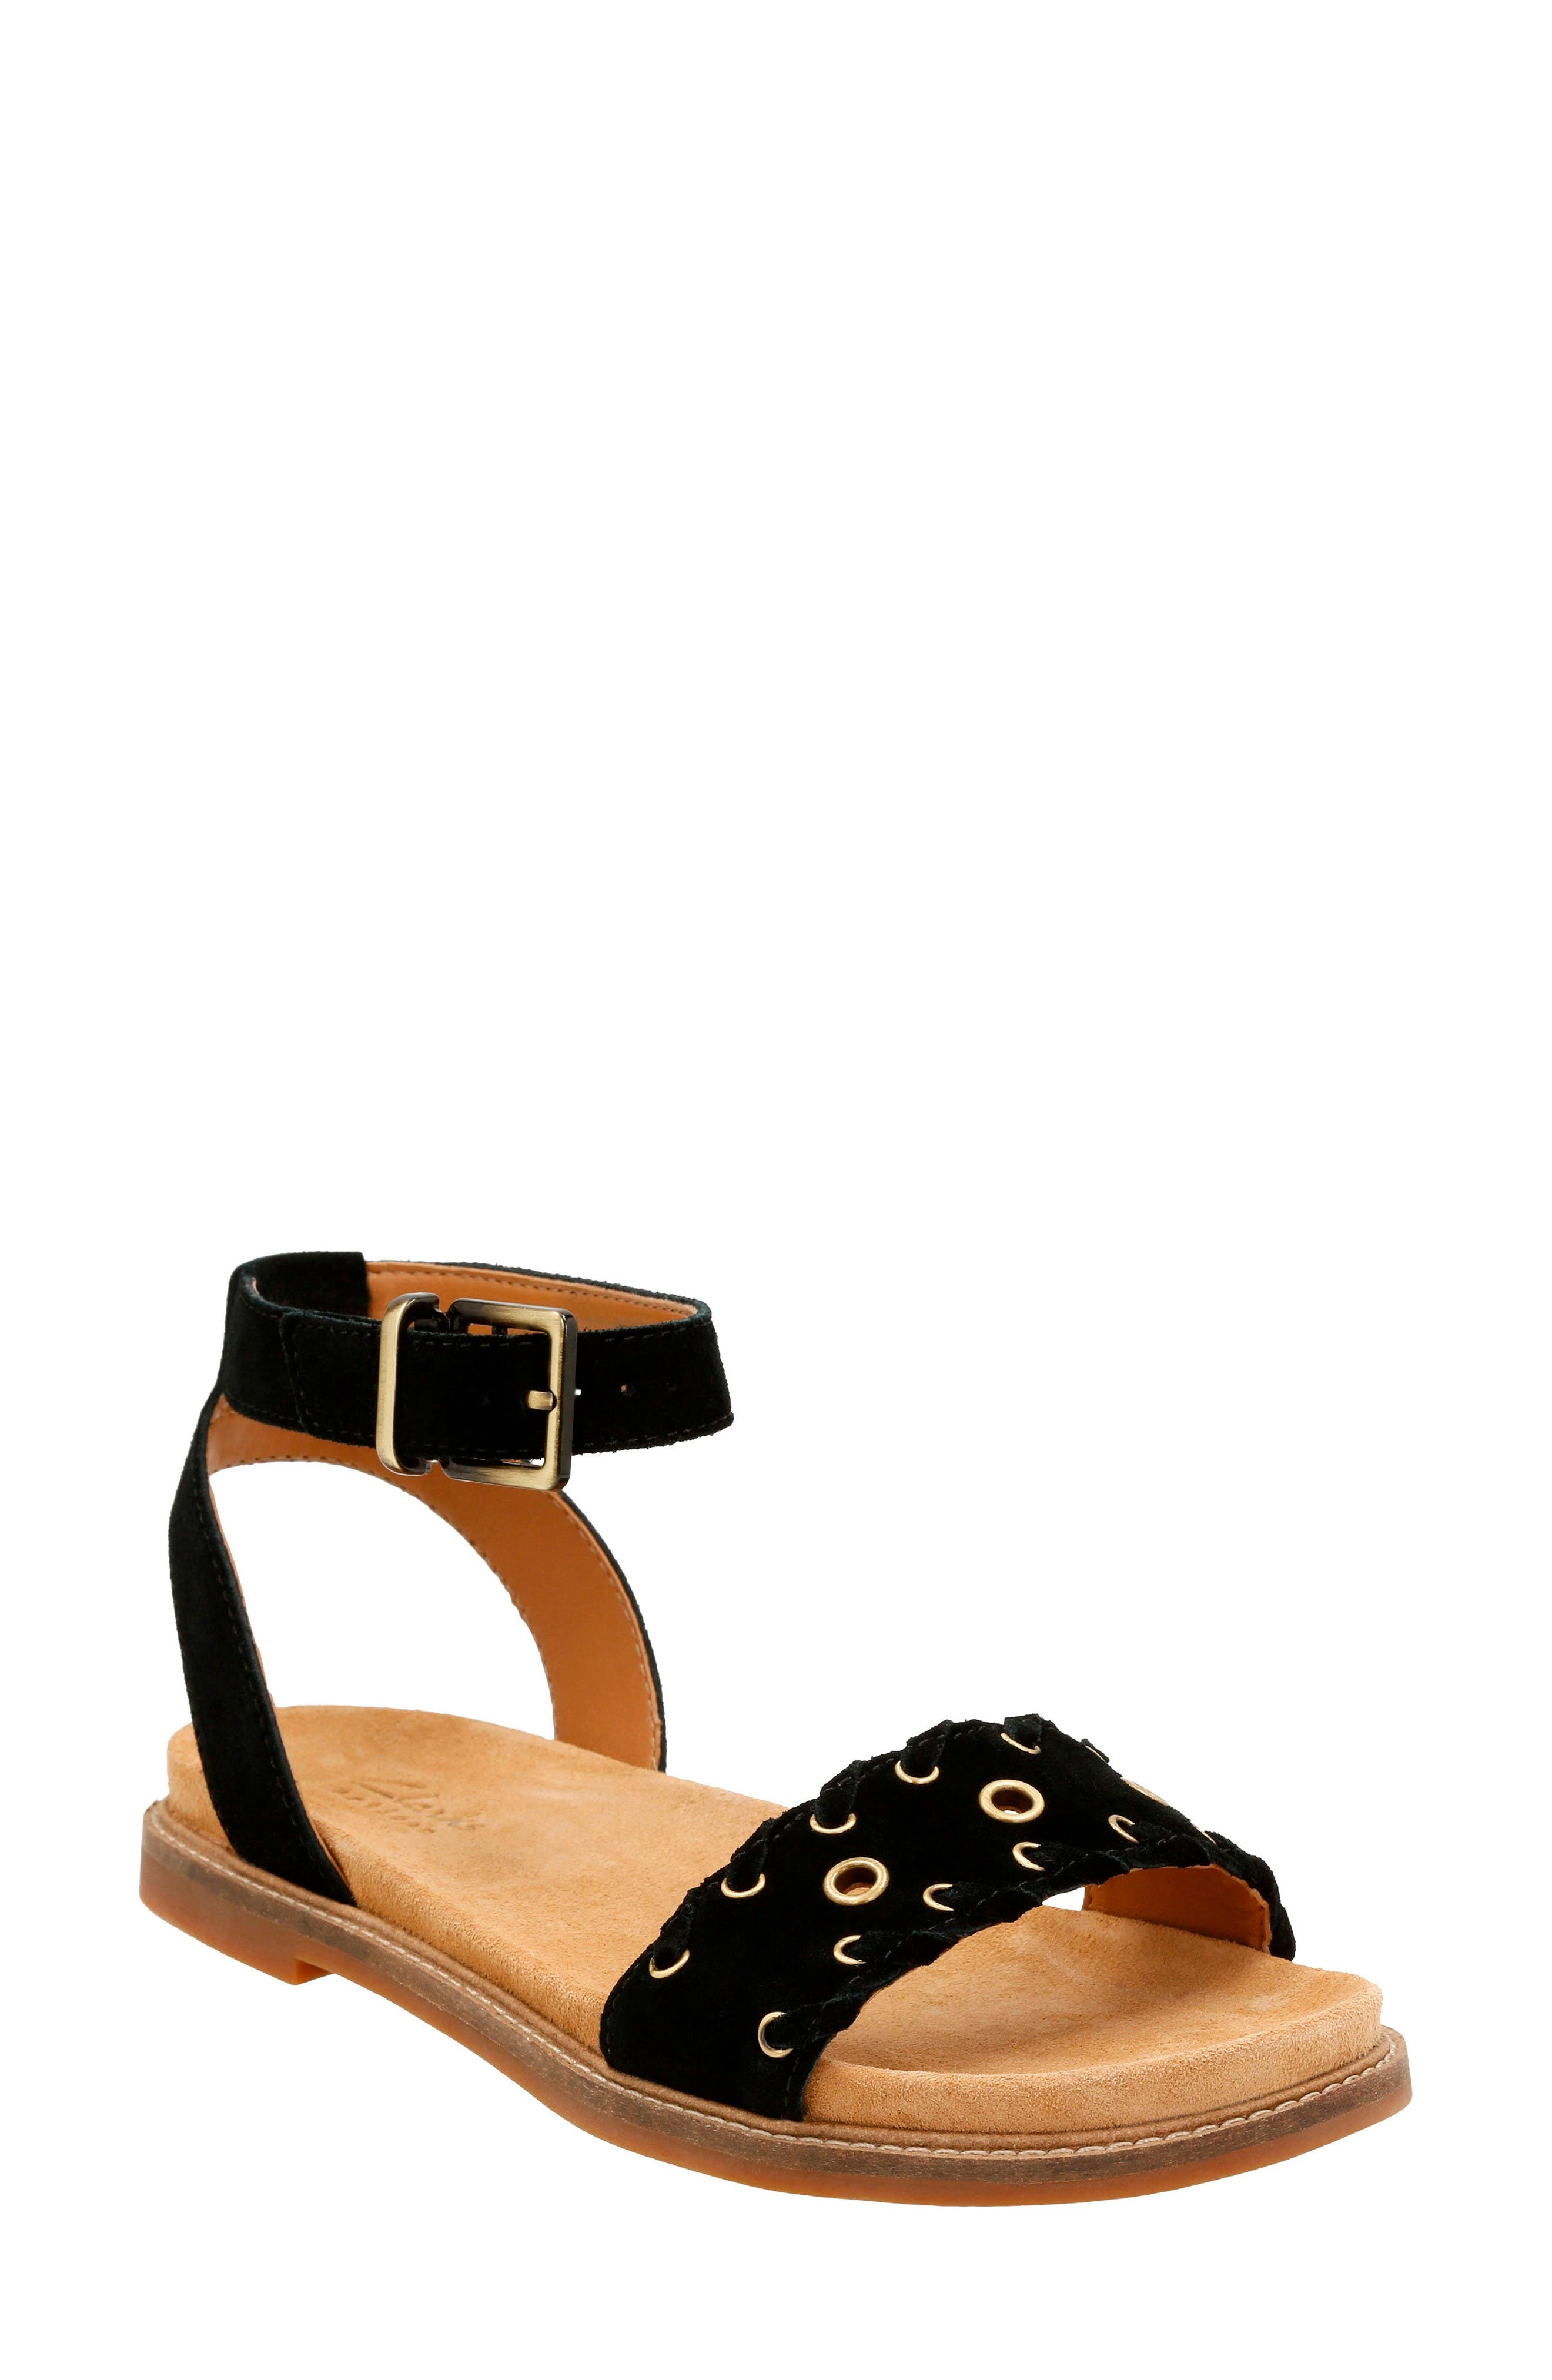 CLARKS<SUP>®</SUP> Corsio Amelia Ankle Strap Sandal